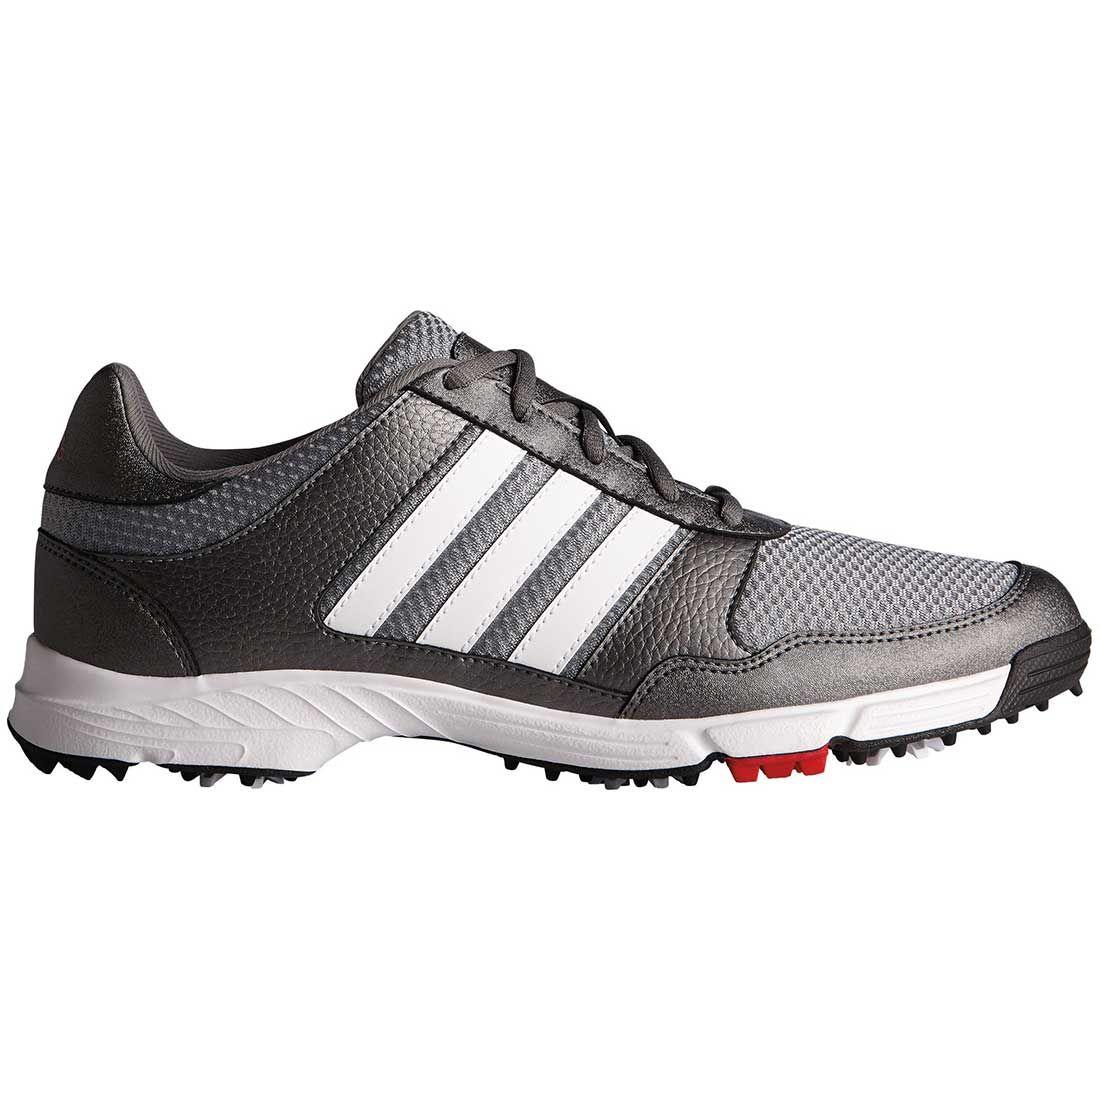 Buy Adidas Tech Response Golf Shoes Iron White Black Golf Discount